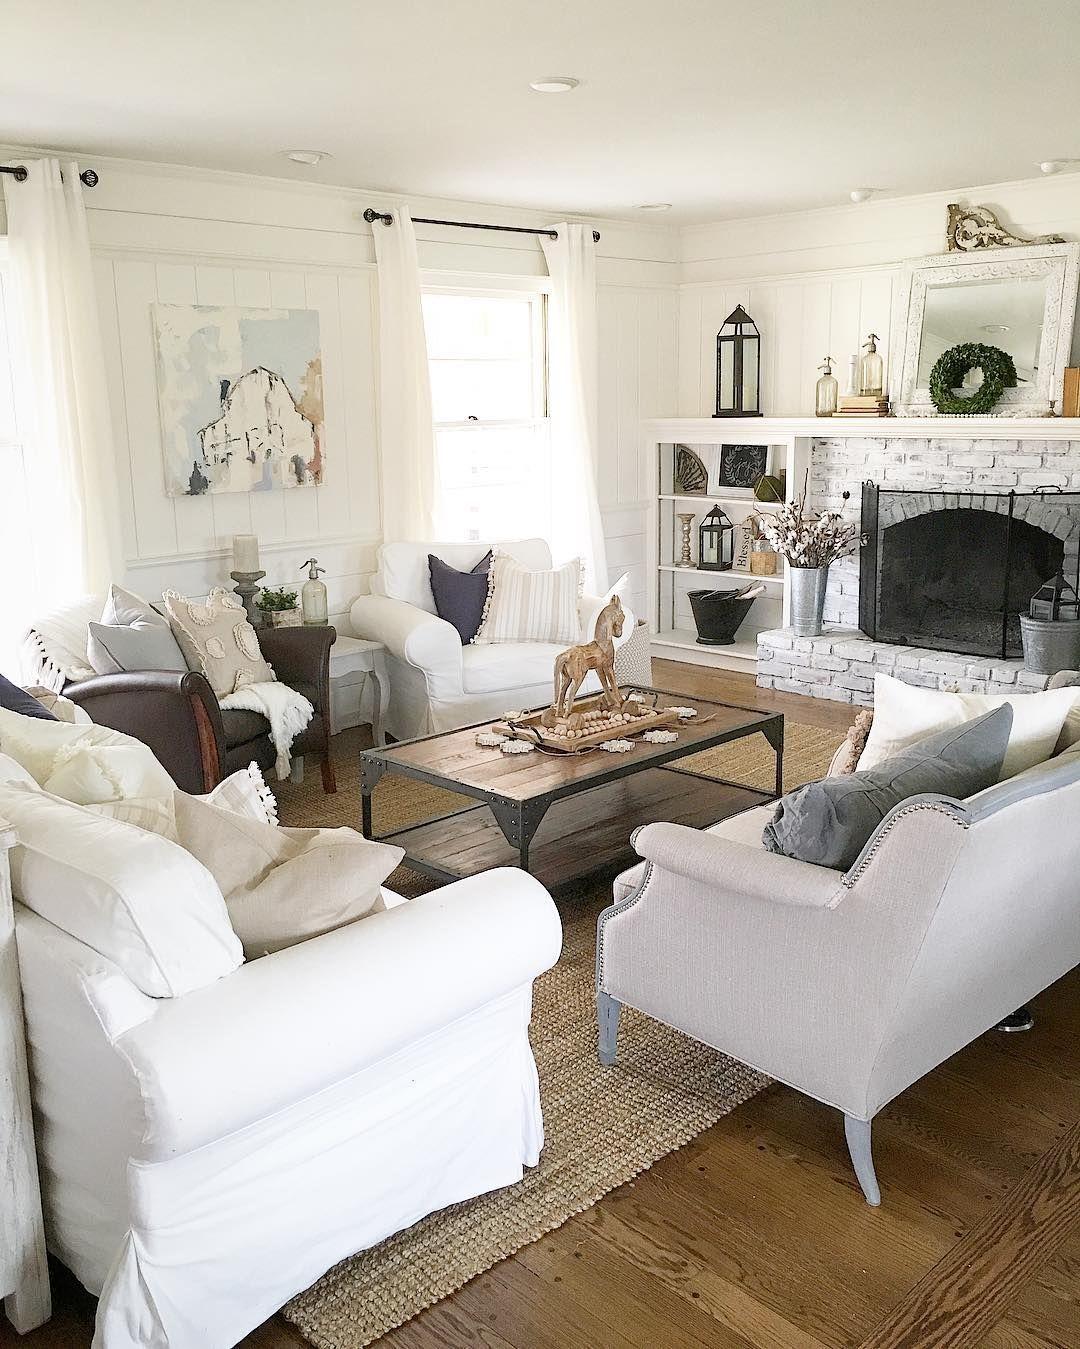 Such a cozy setup | Cottage style | Pinterest | Living rooms, Cozy ...